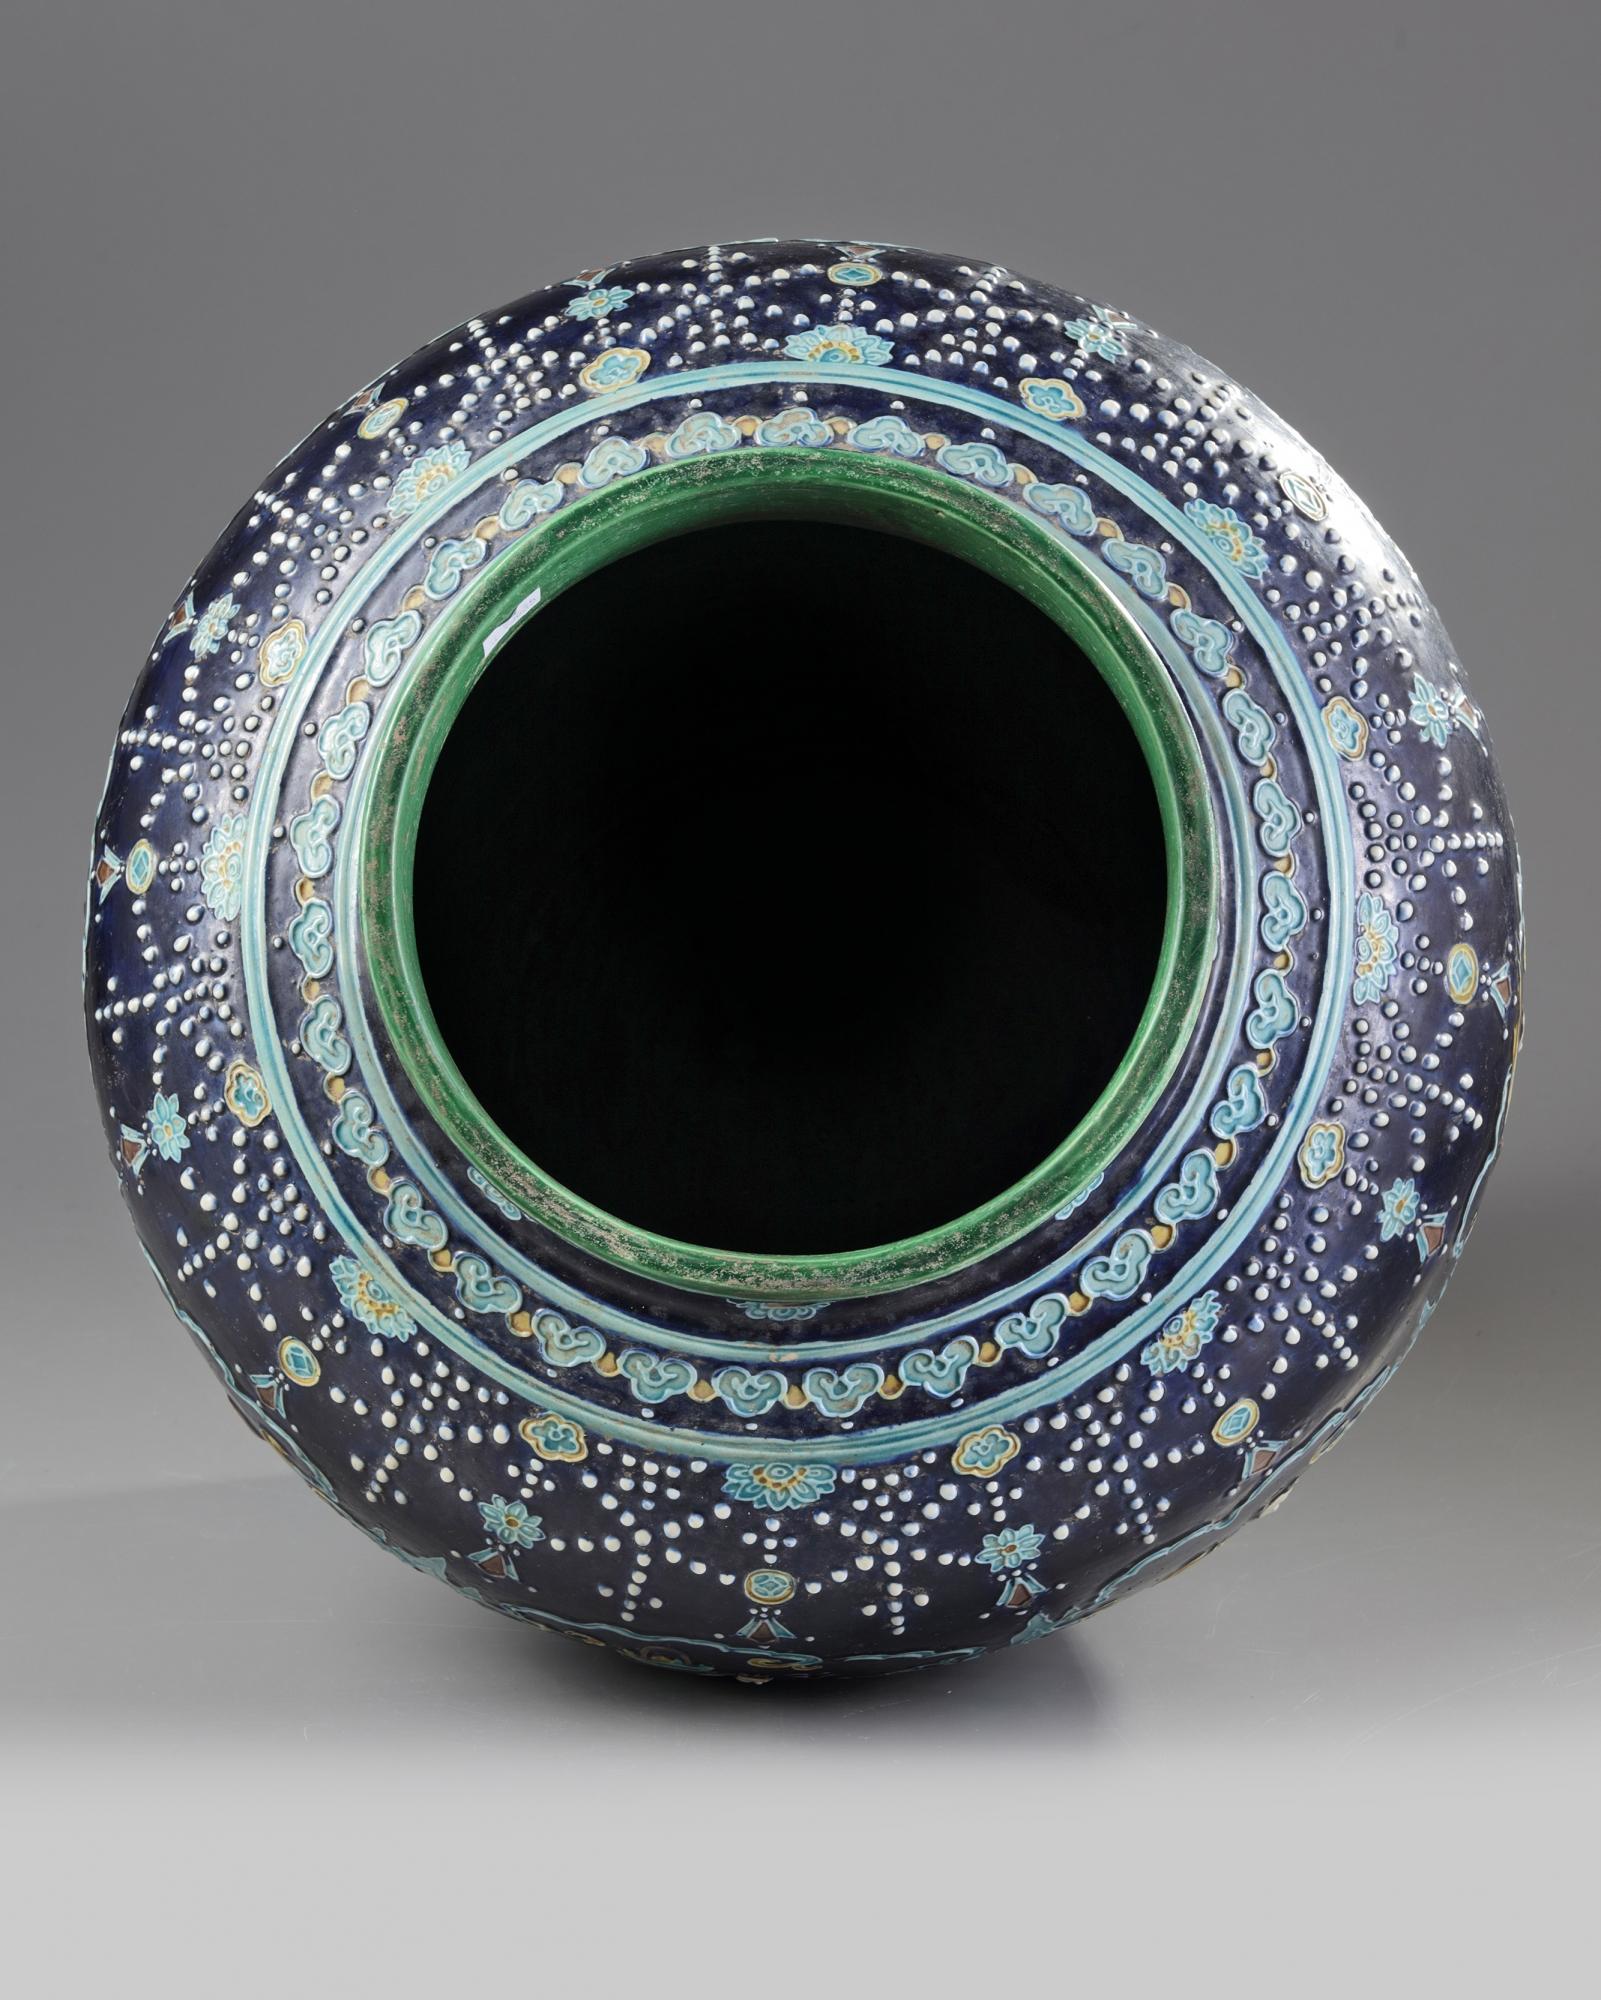 Lot 56 - A Chinese fahua 'Eight Immortals' jar